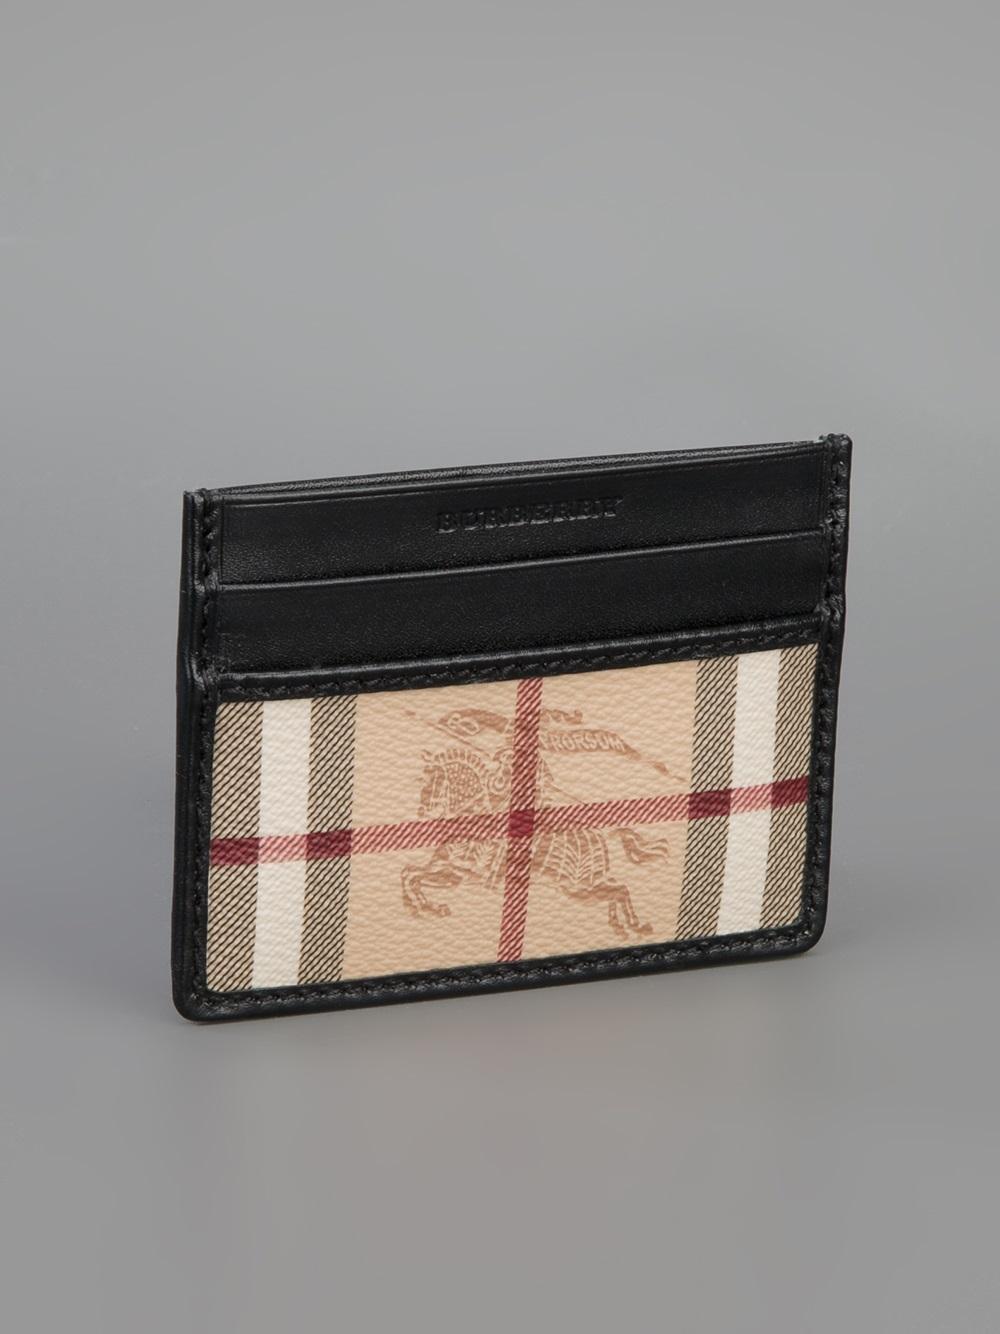 Burberry Camo Print Leather Card Holder